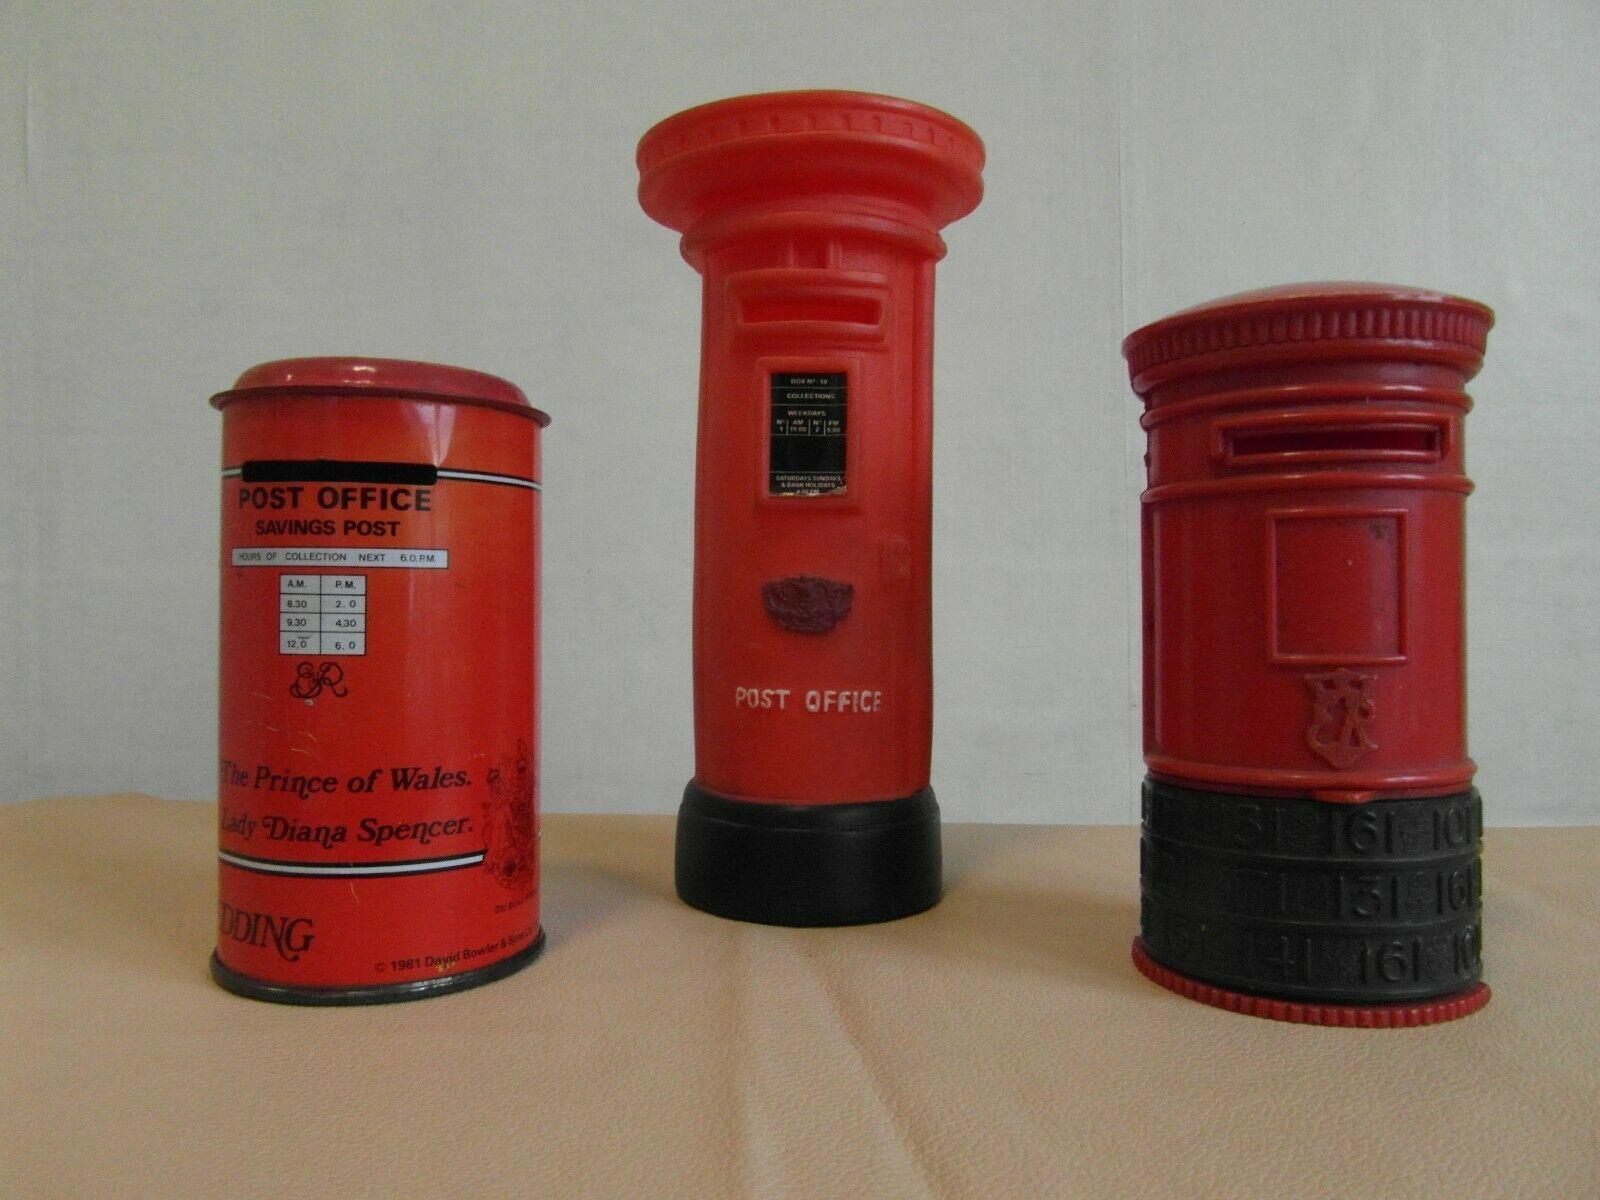 Three Collectable Vintage Royal Mail Pillar Post Boxes Money Savings Box In 2020 Money Saving Box Savings Box Pillar And Post